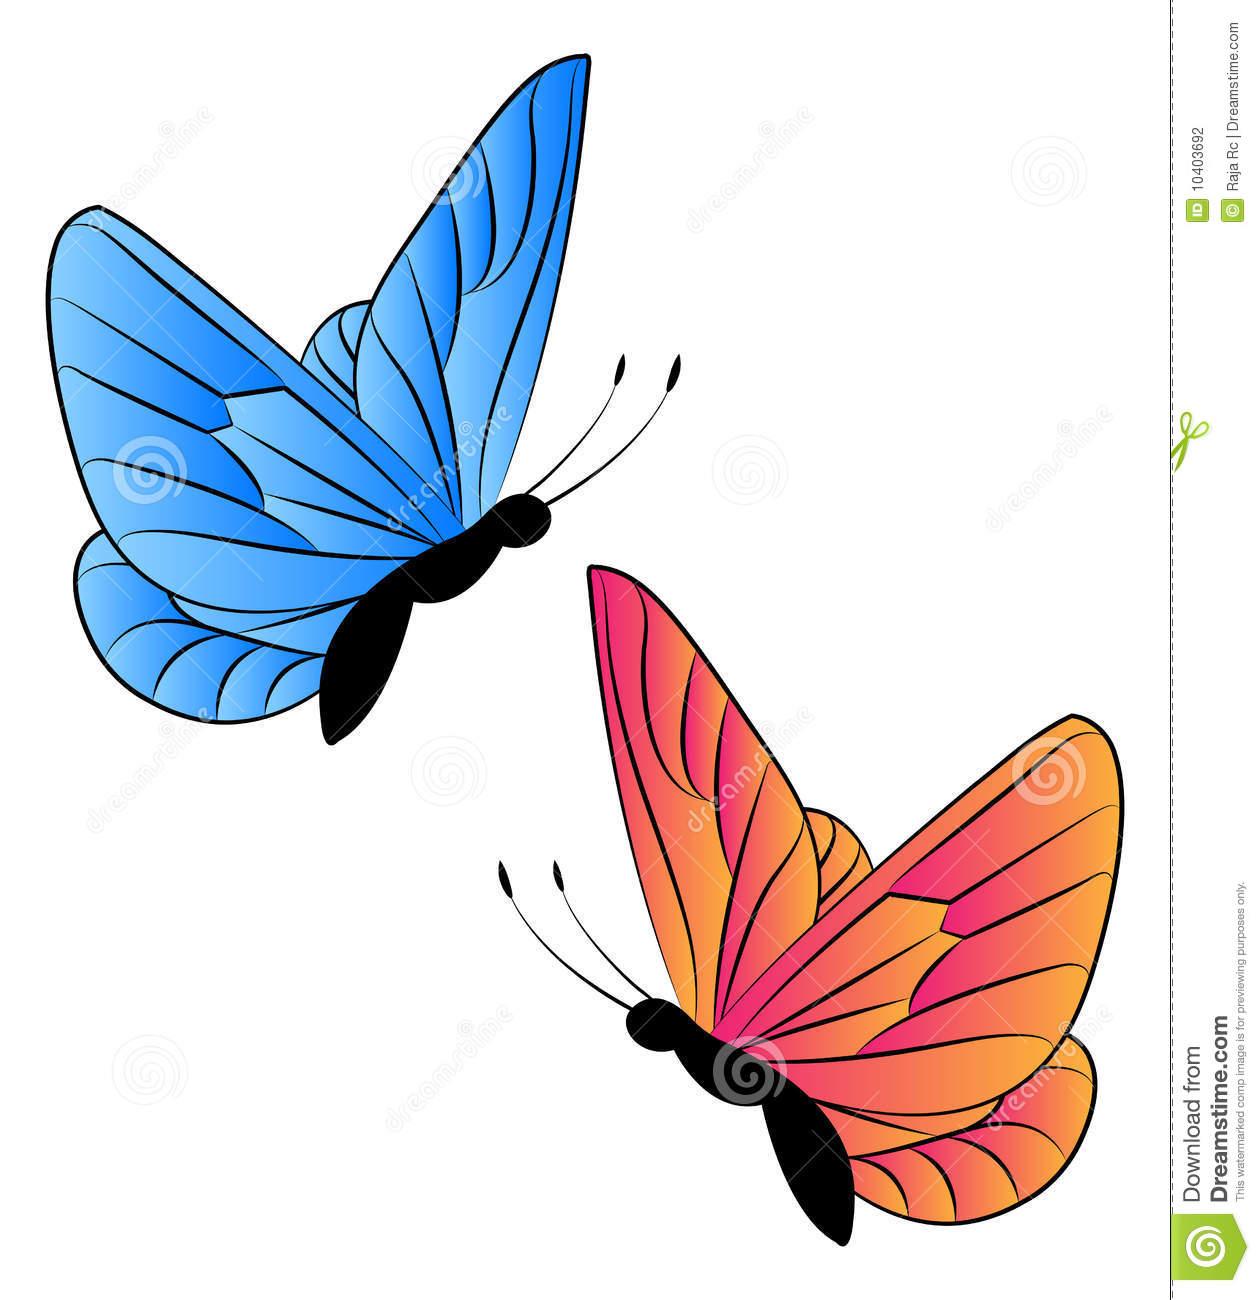 Clip art clipartall com. Clipart images for april butterflies